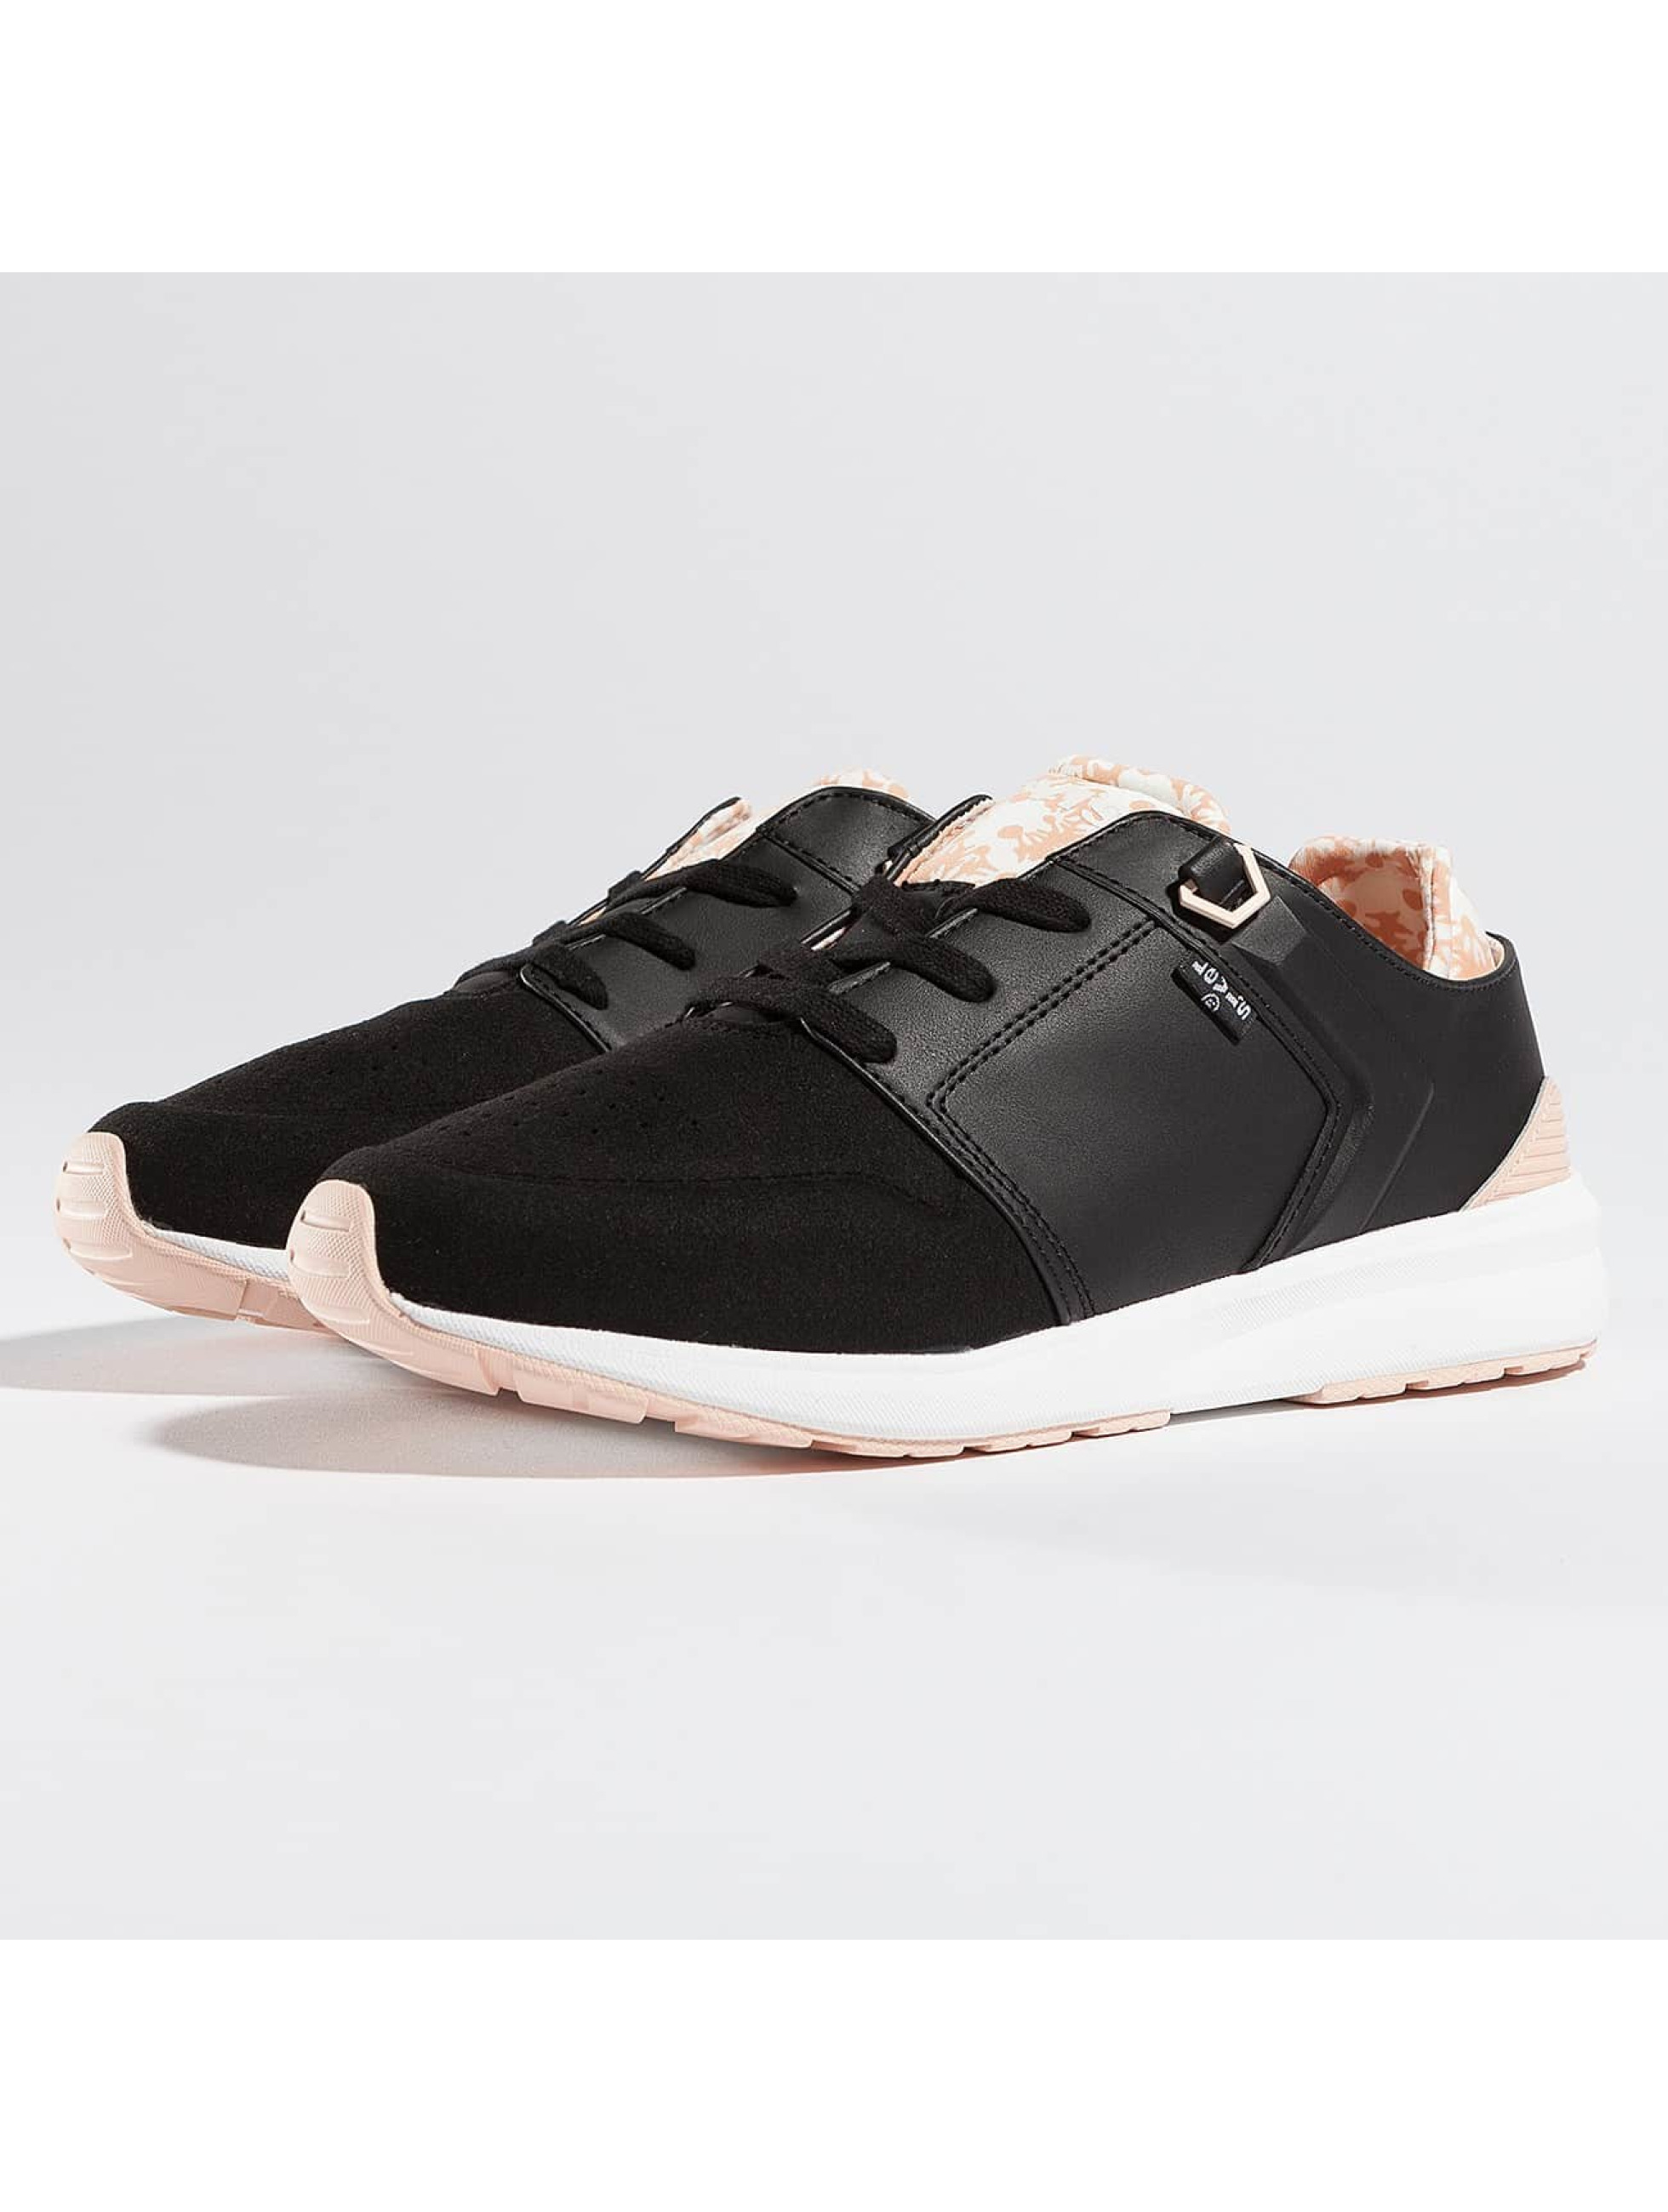 levi 39 s damen schuhe sneaker black tab runner ebay. Black Bedroom Furniture Sets. Home Design Ideas